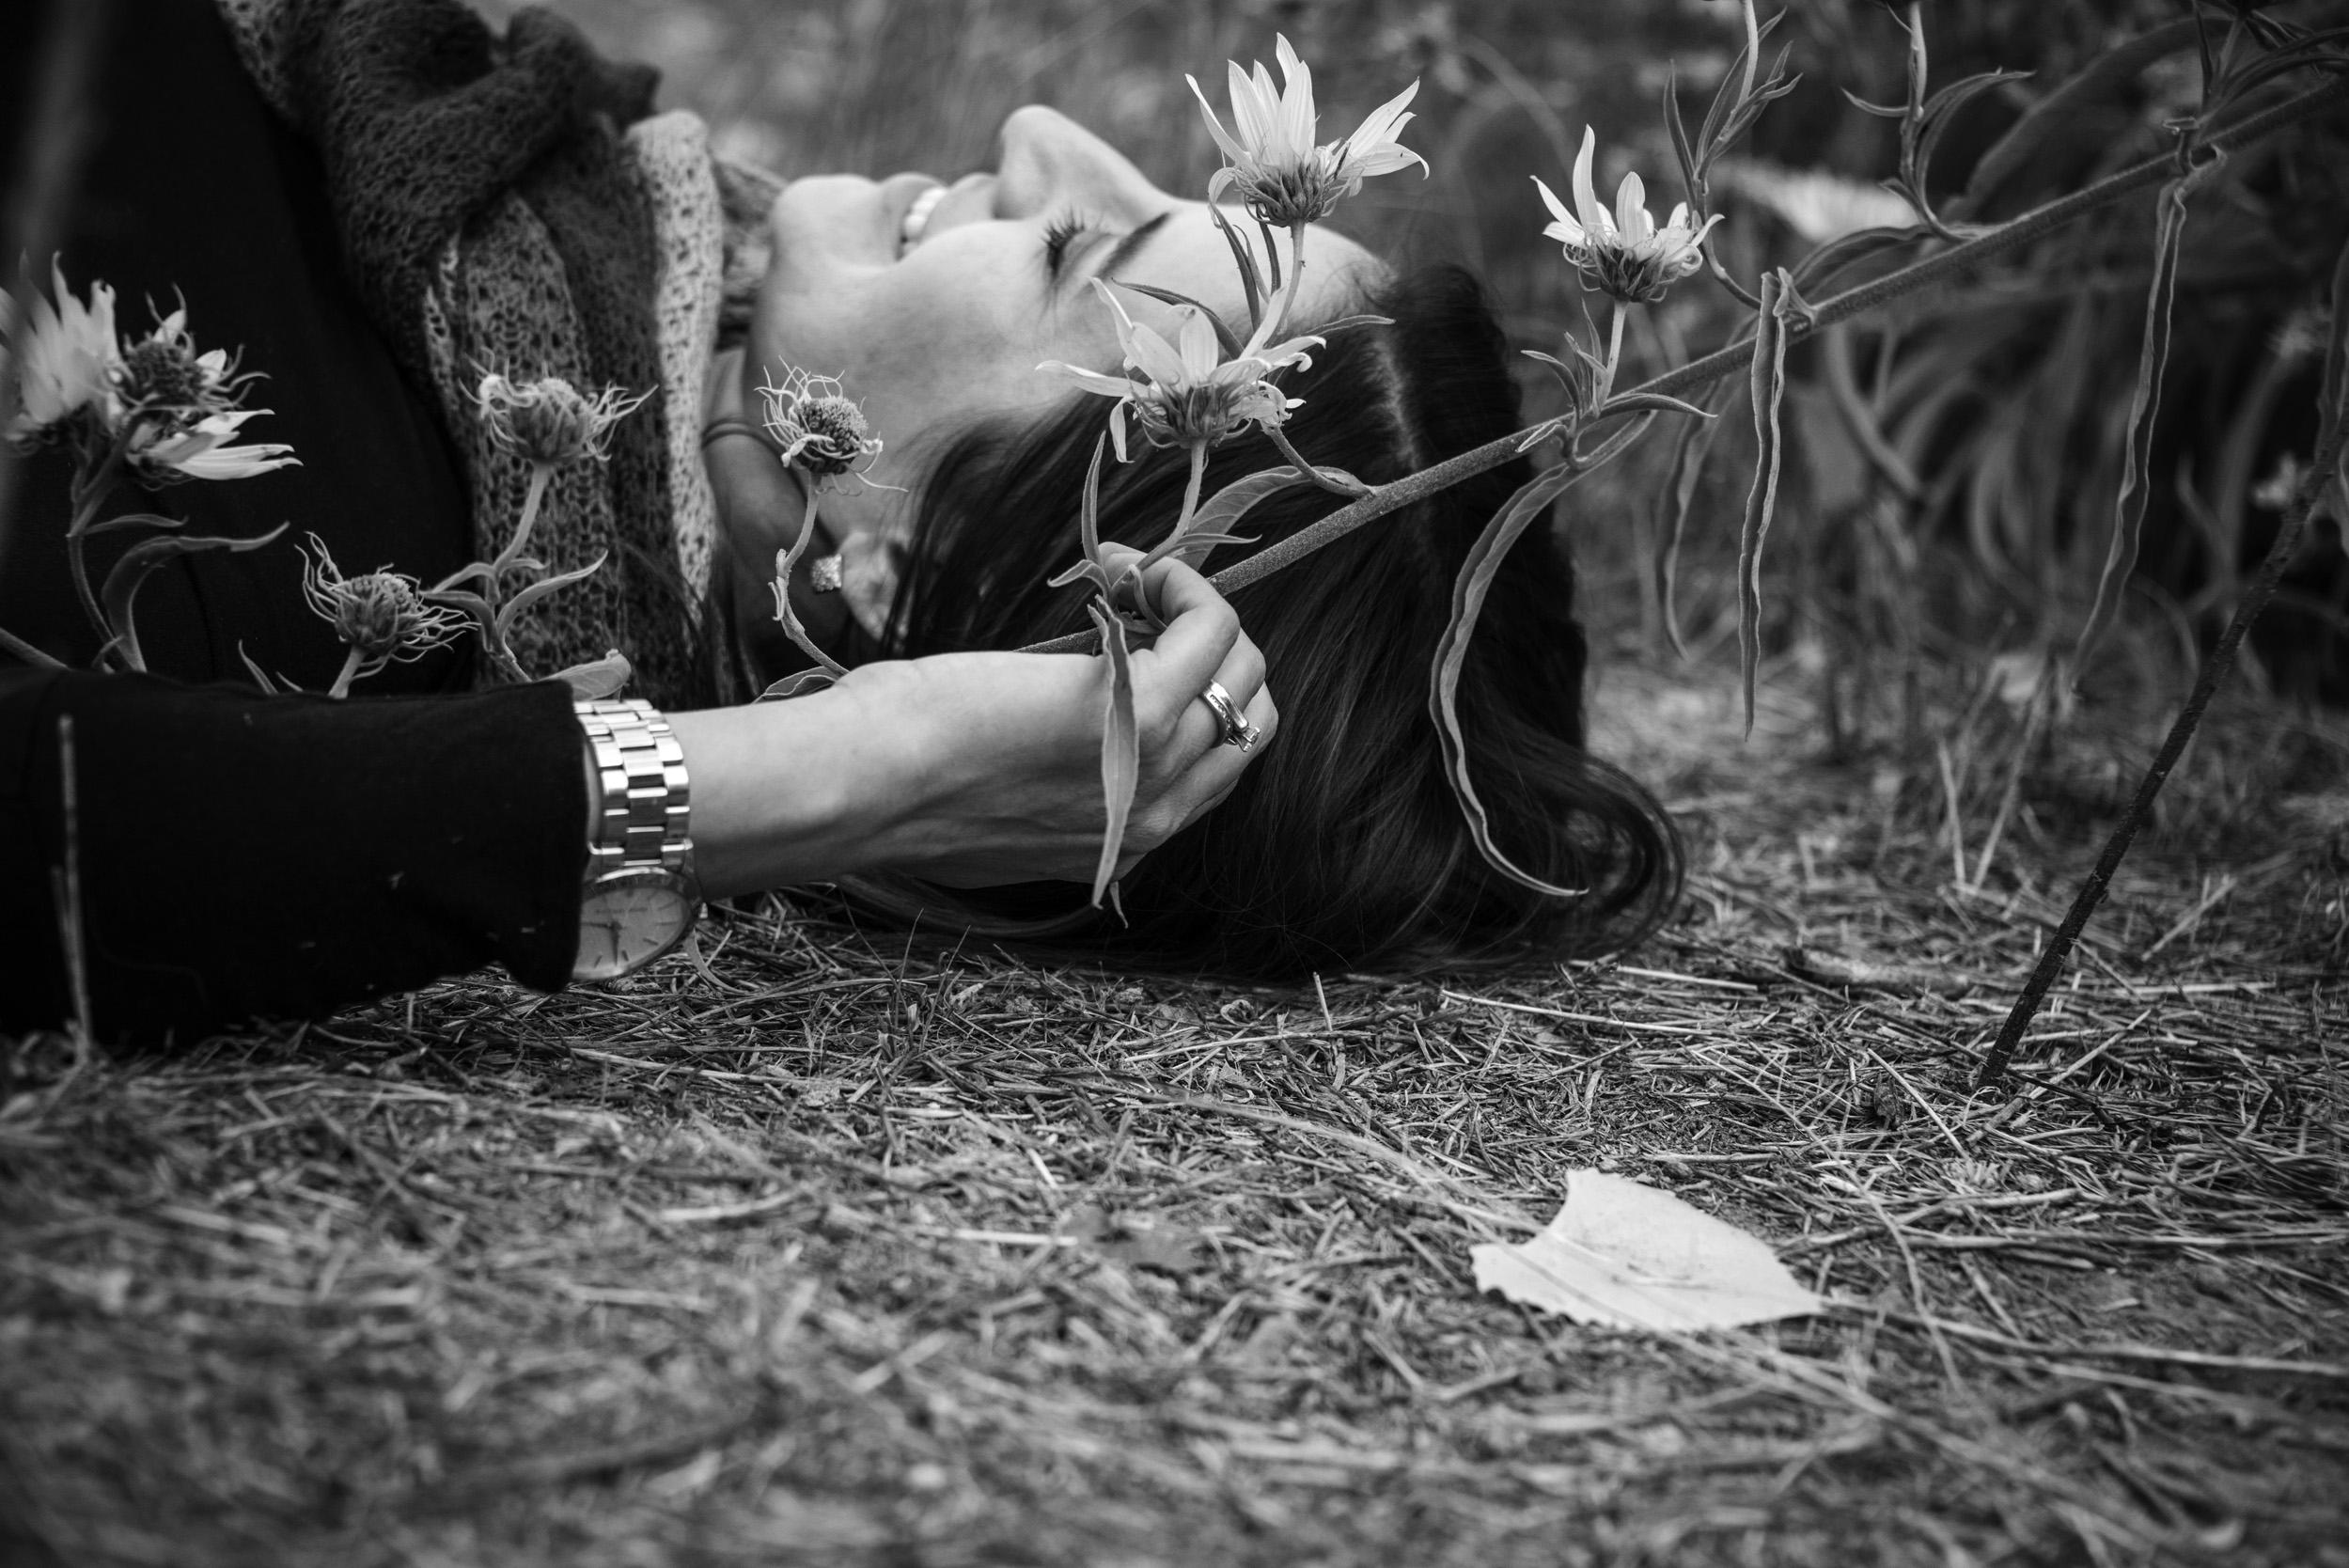 Britt_Nemeth_Photography_Branding_Lifestyle_Brand_Soulful_Portrait033.jpg